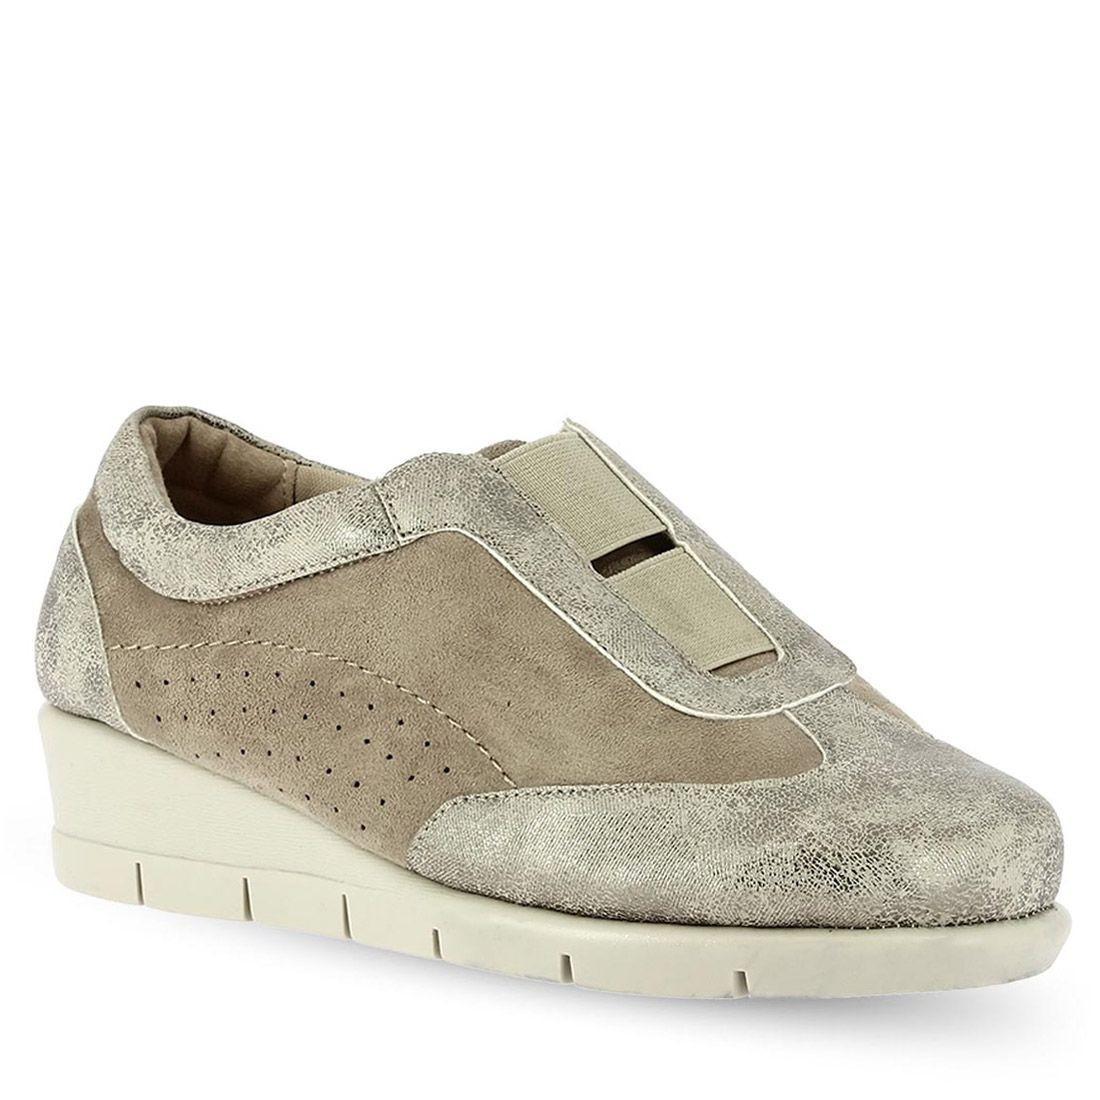 43ae2a203aca PAREX Γυναικεία Παπούτσια Sneakers Ανατομικά 10719001.P Πλατίνα ...